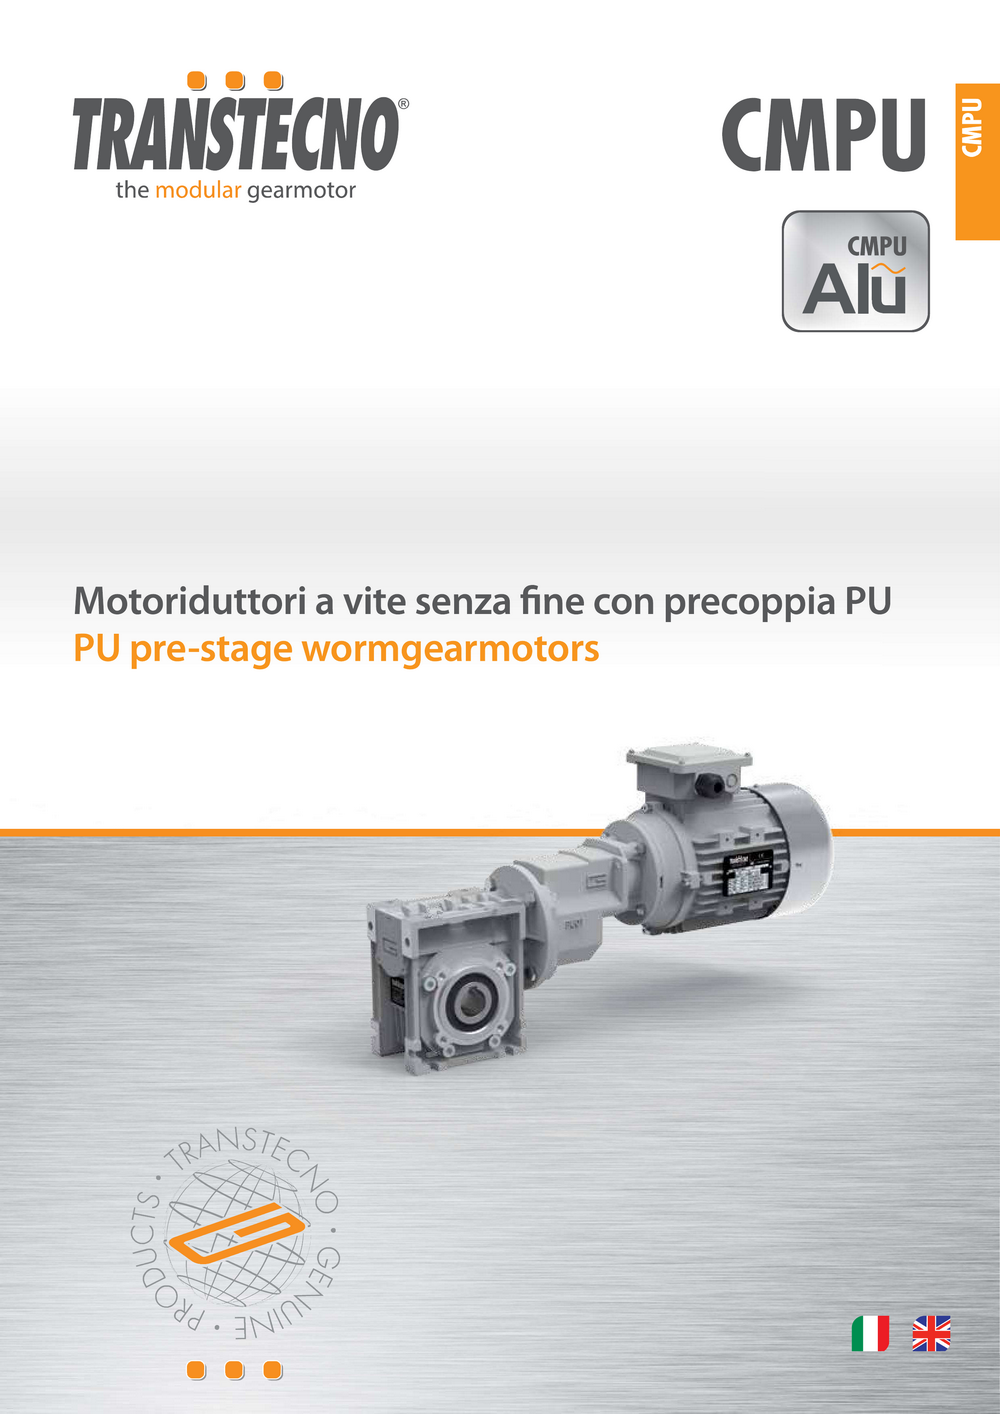 Цилиндро-червячный мотор-редуктор CMPU Transtecno.